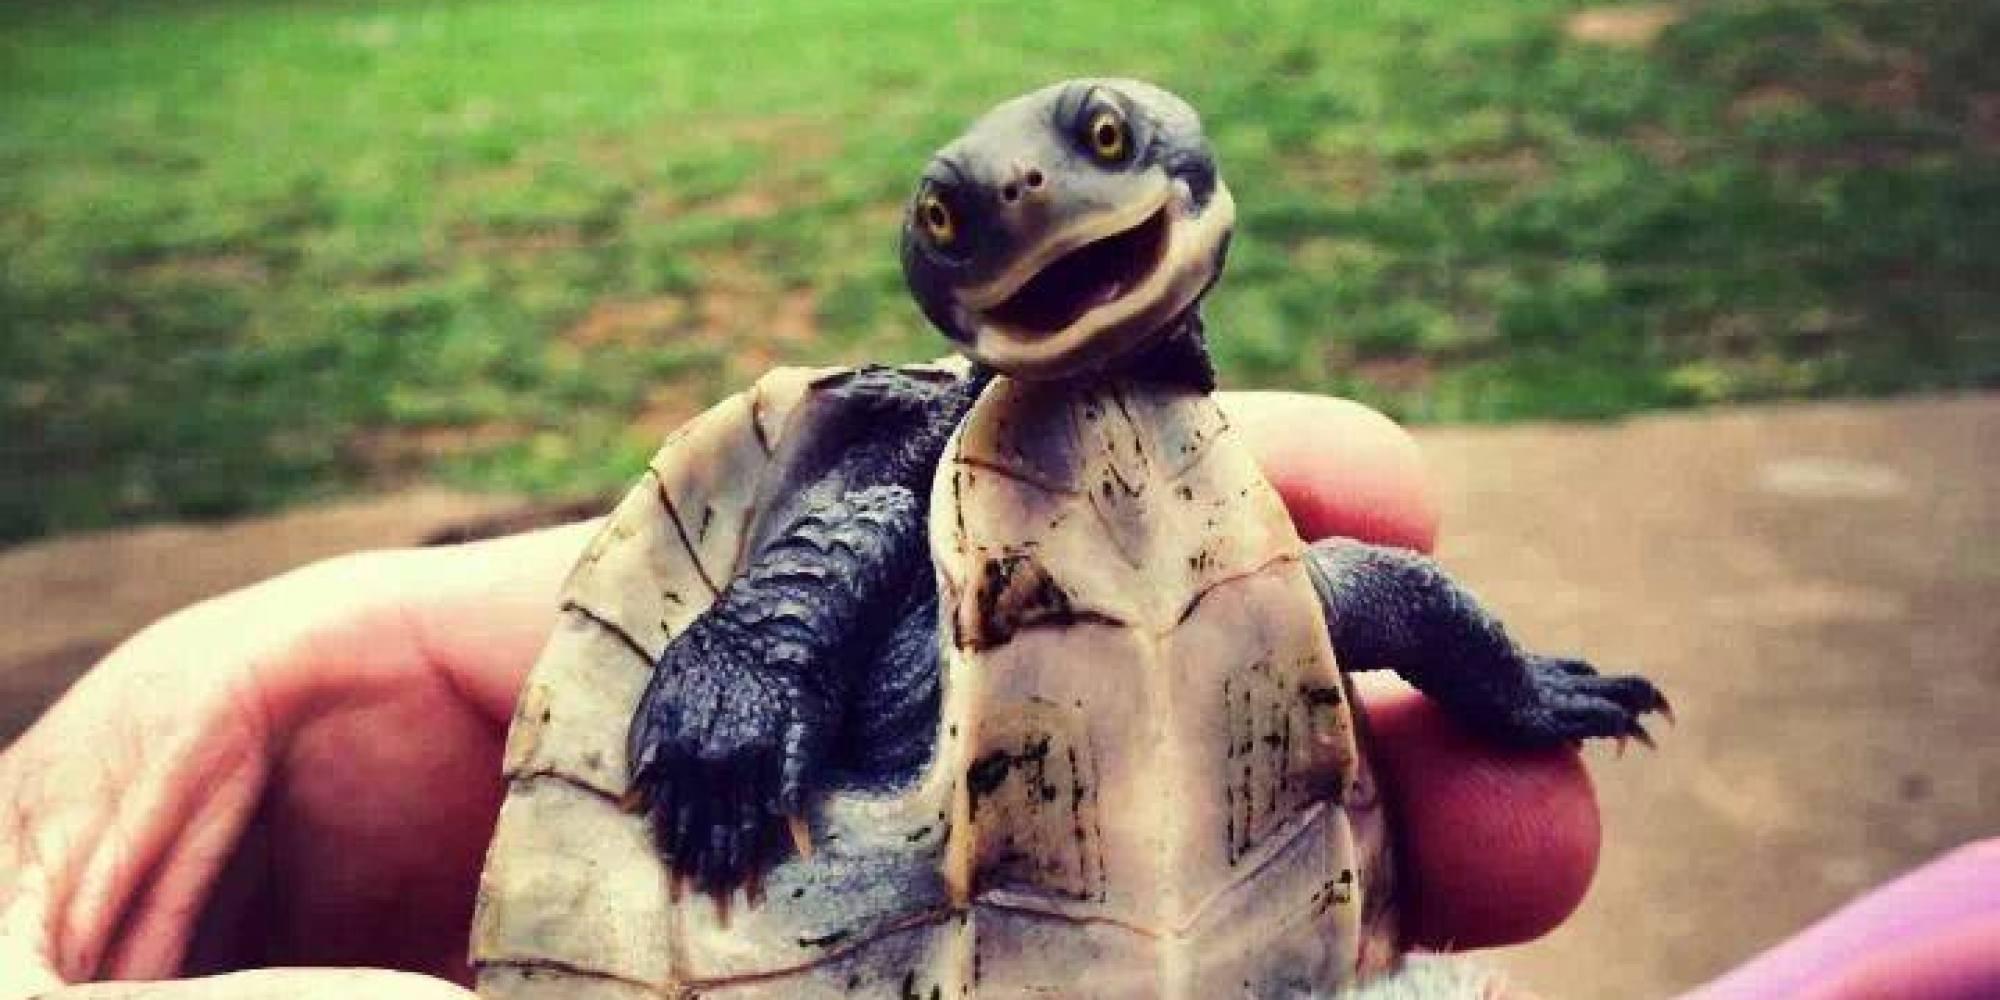 o-CUTE-SMILING-TURTLE-facebook